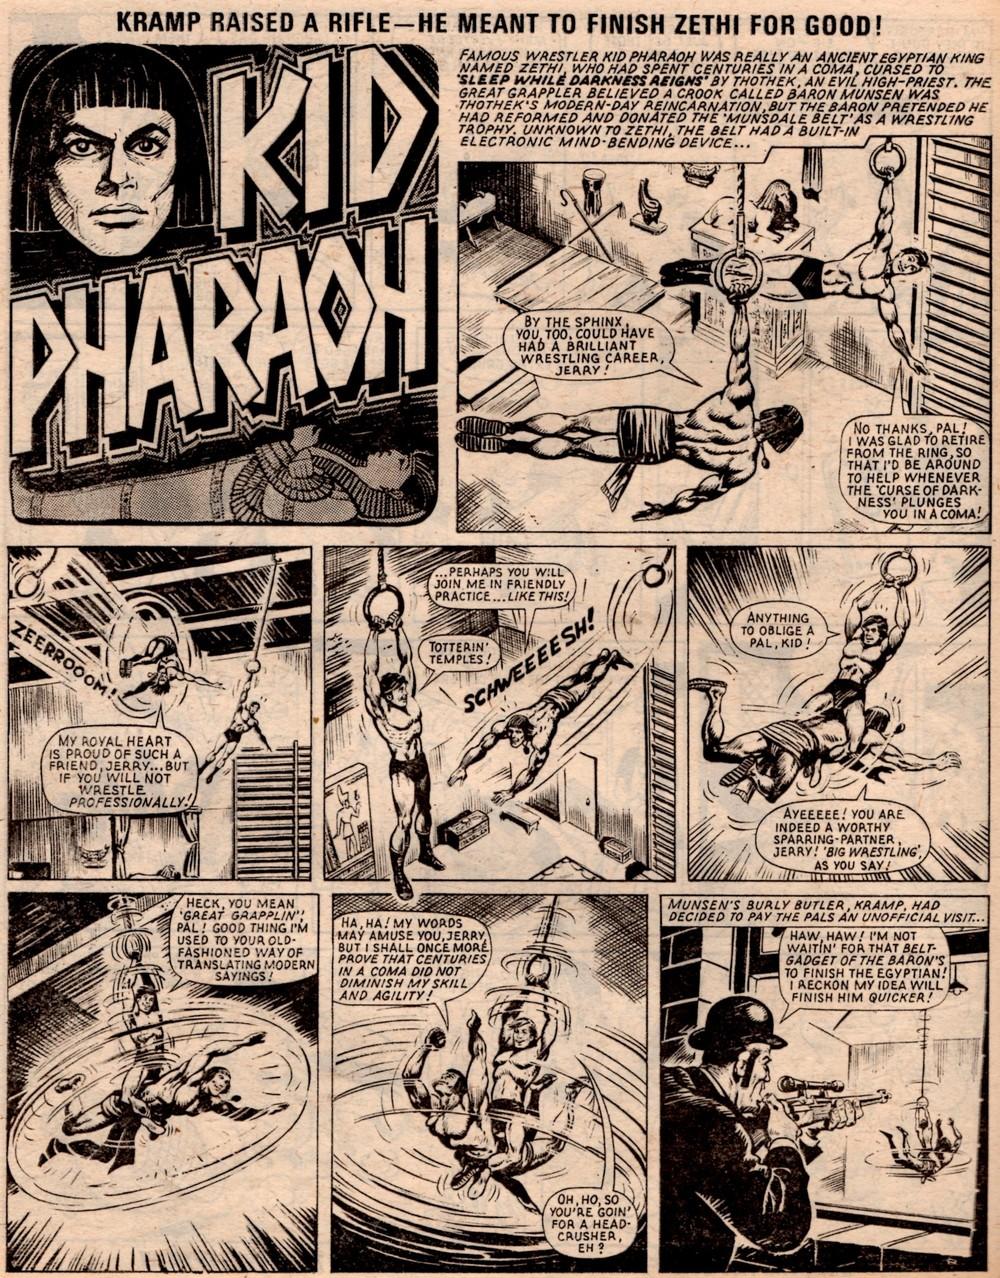 Kid Pharaoh: Solano Lopez studio (artist)